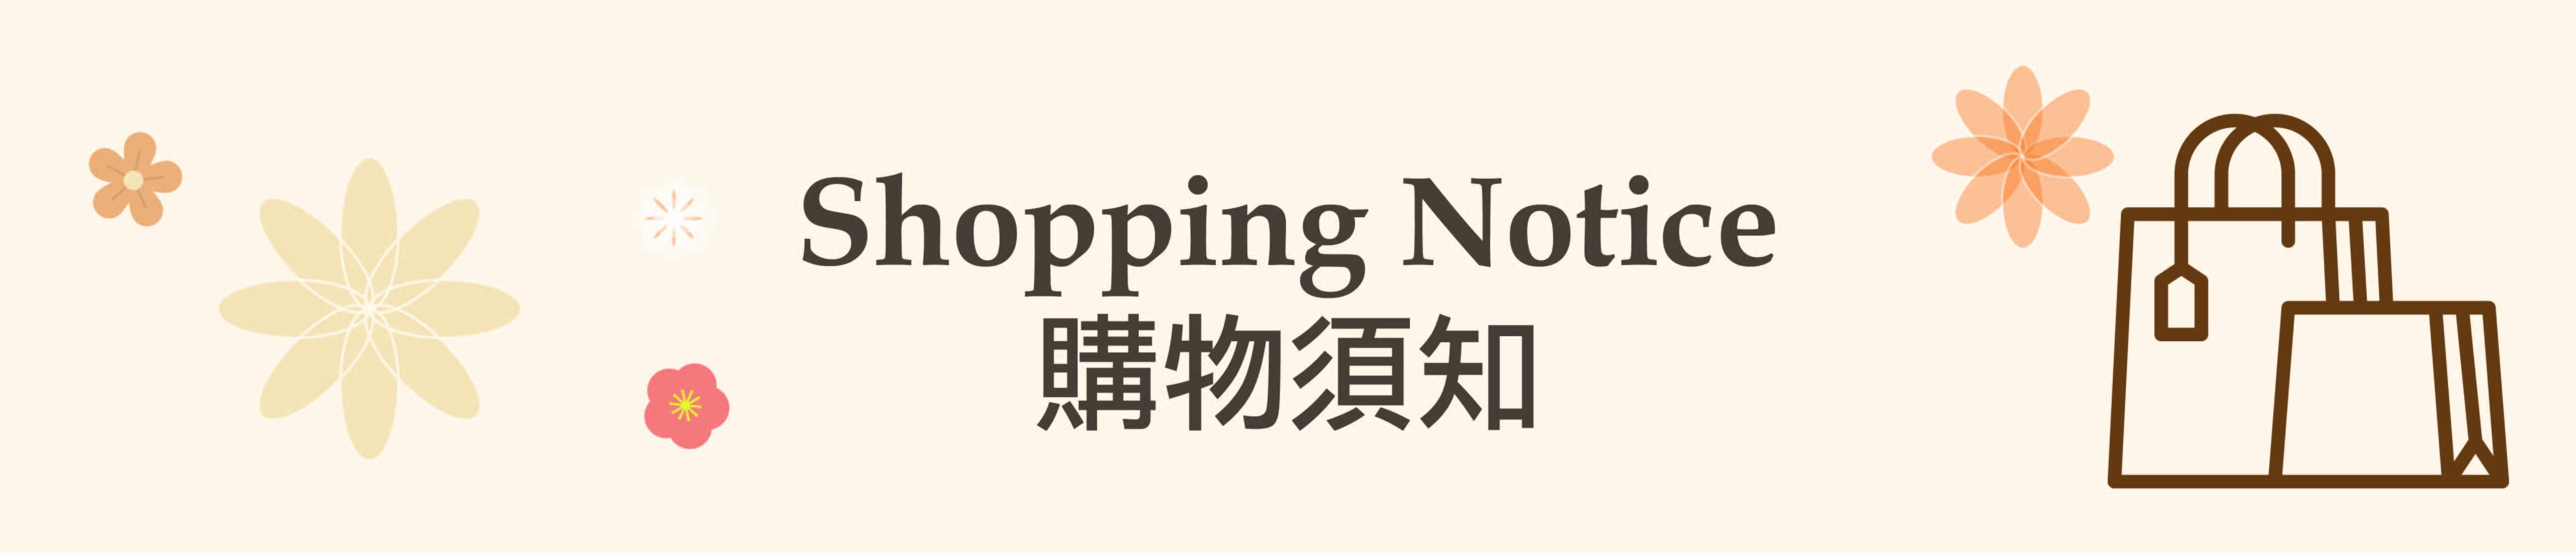 shopping notice-08.jpg